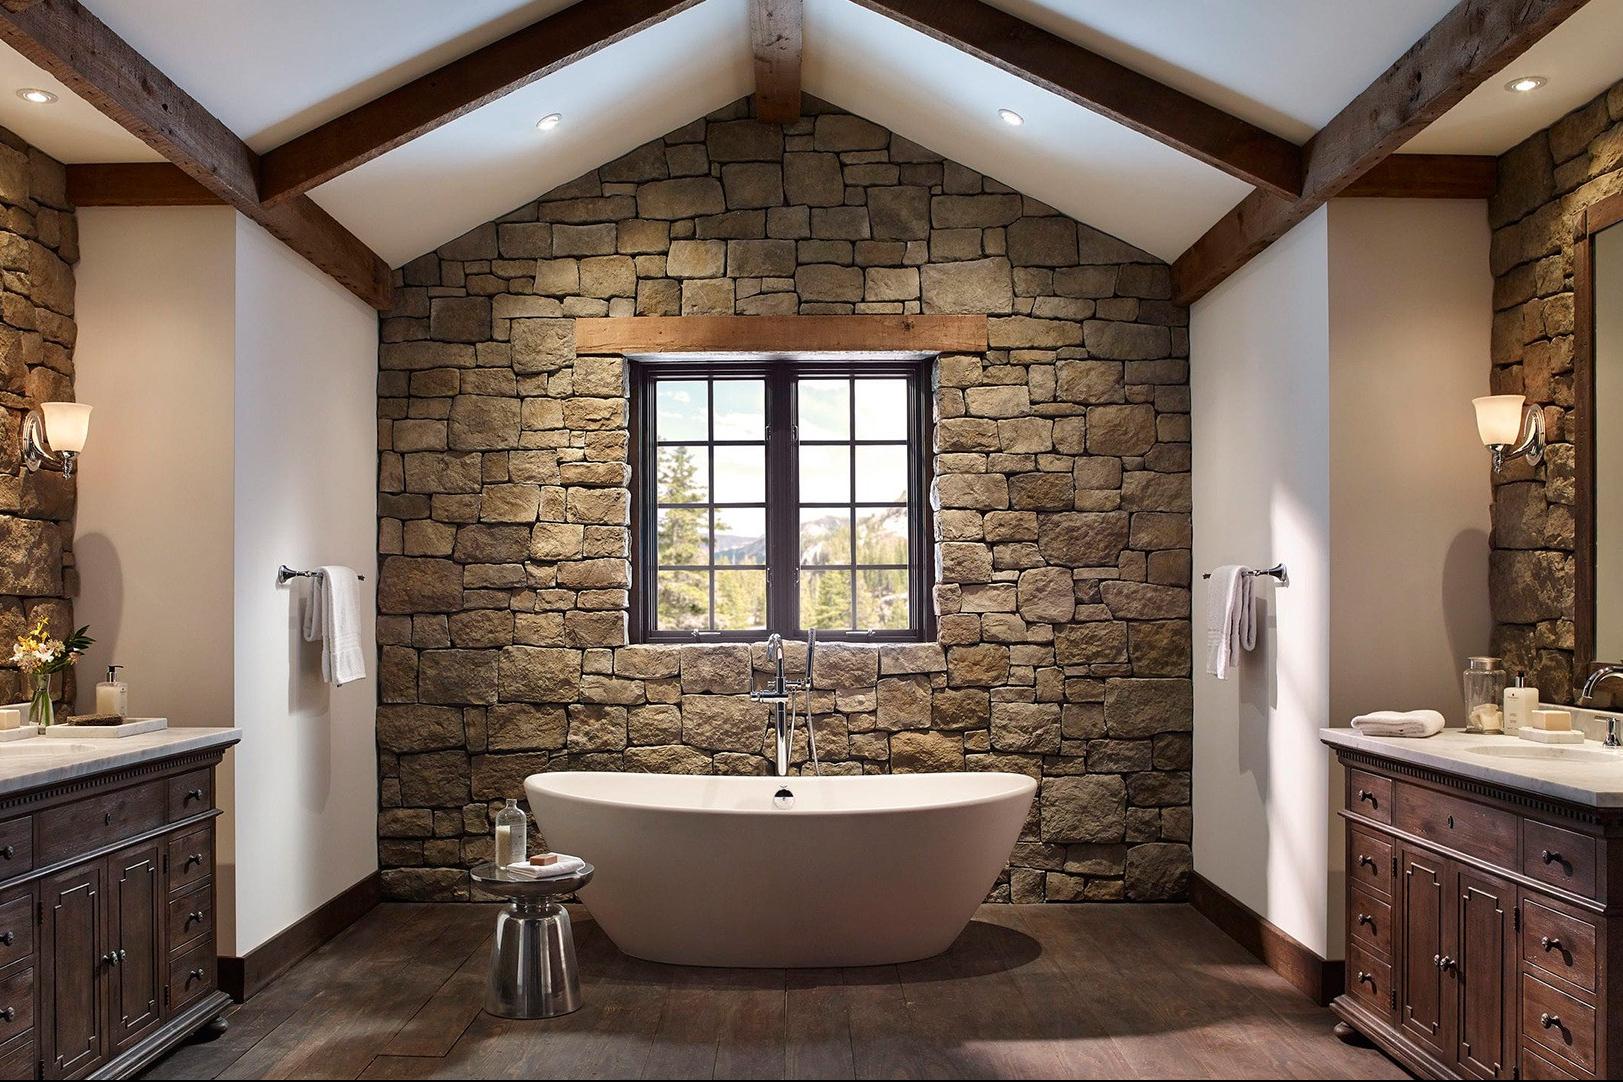 7 Desain Kamar Mandi Batu Alam Kesan Naturalnya Bikin Rileks